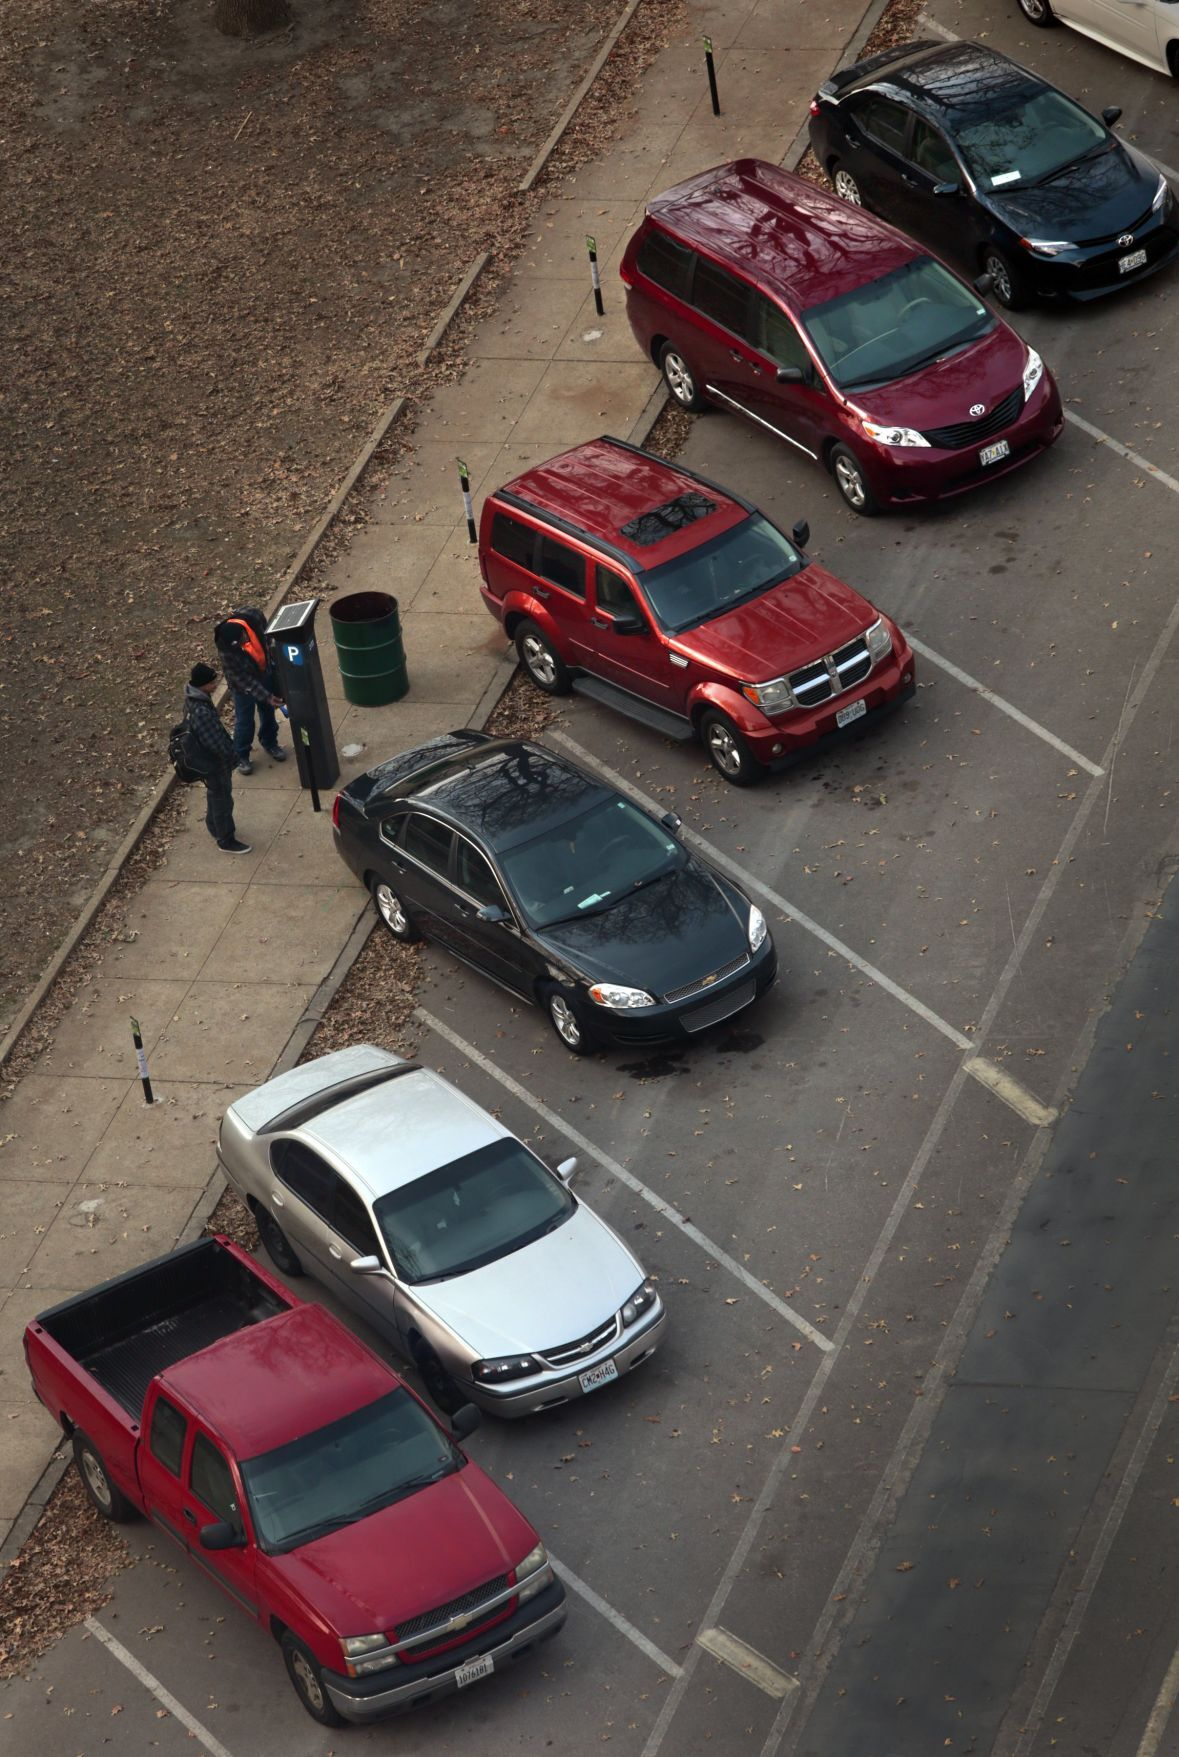 St. Louis parking revenue runs through Treasurer's office